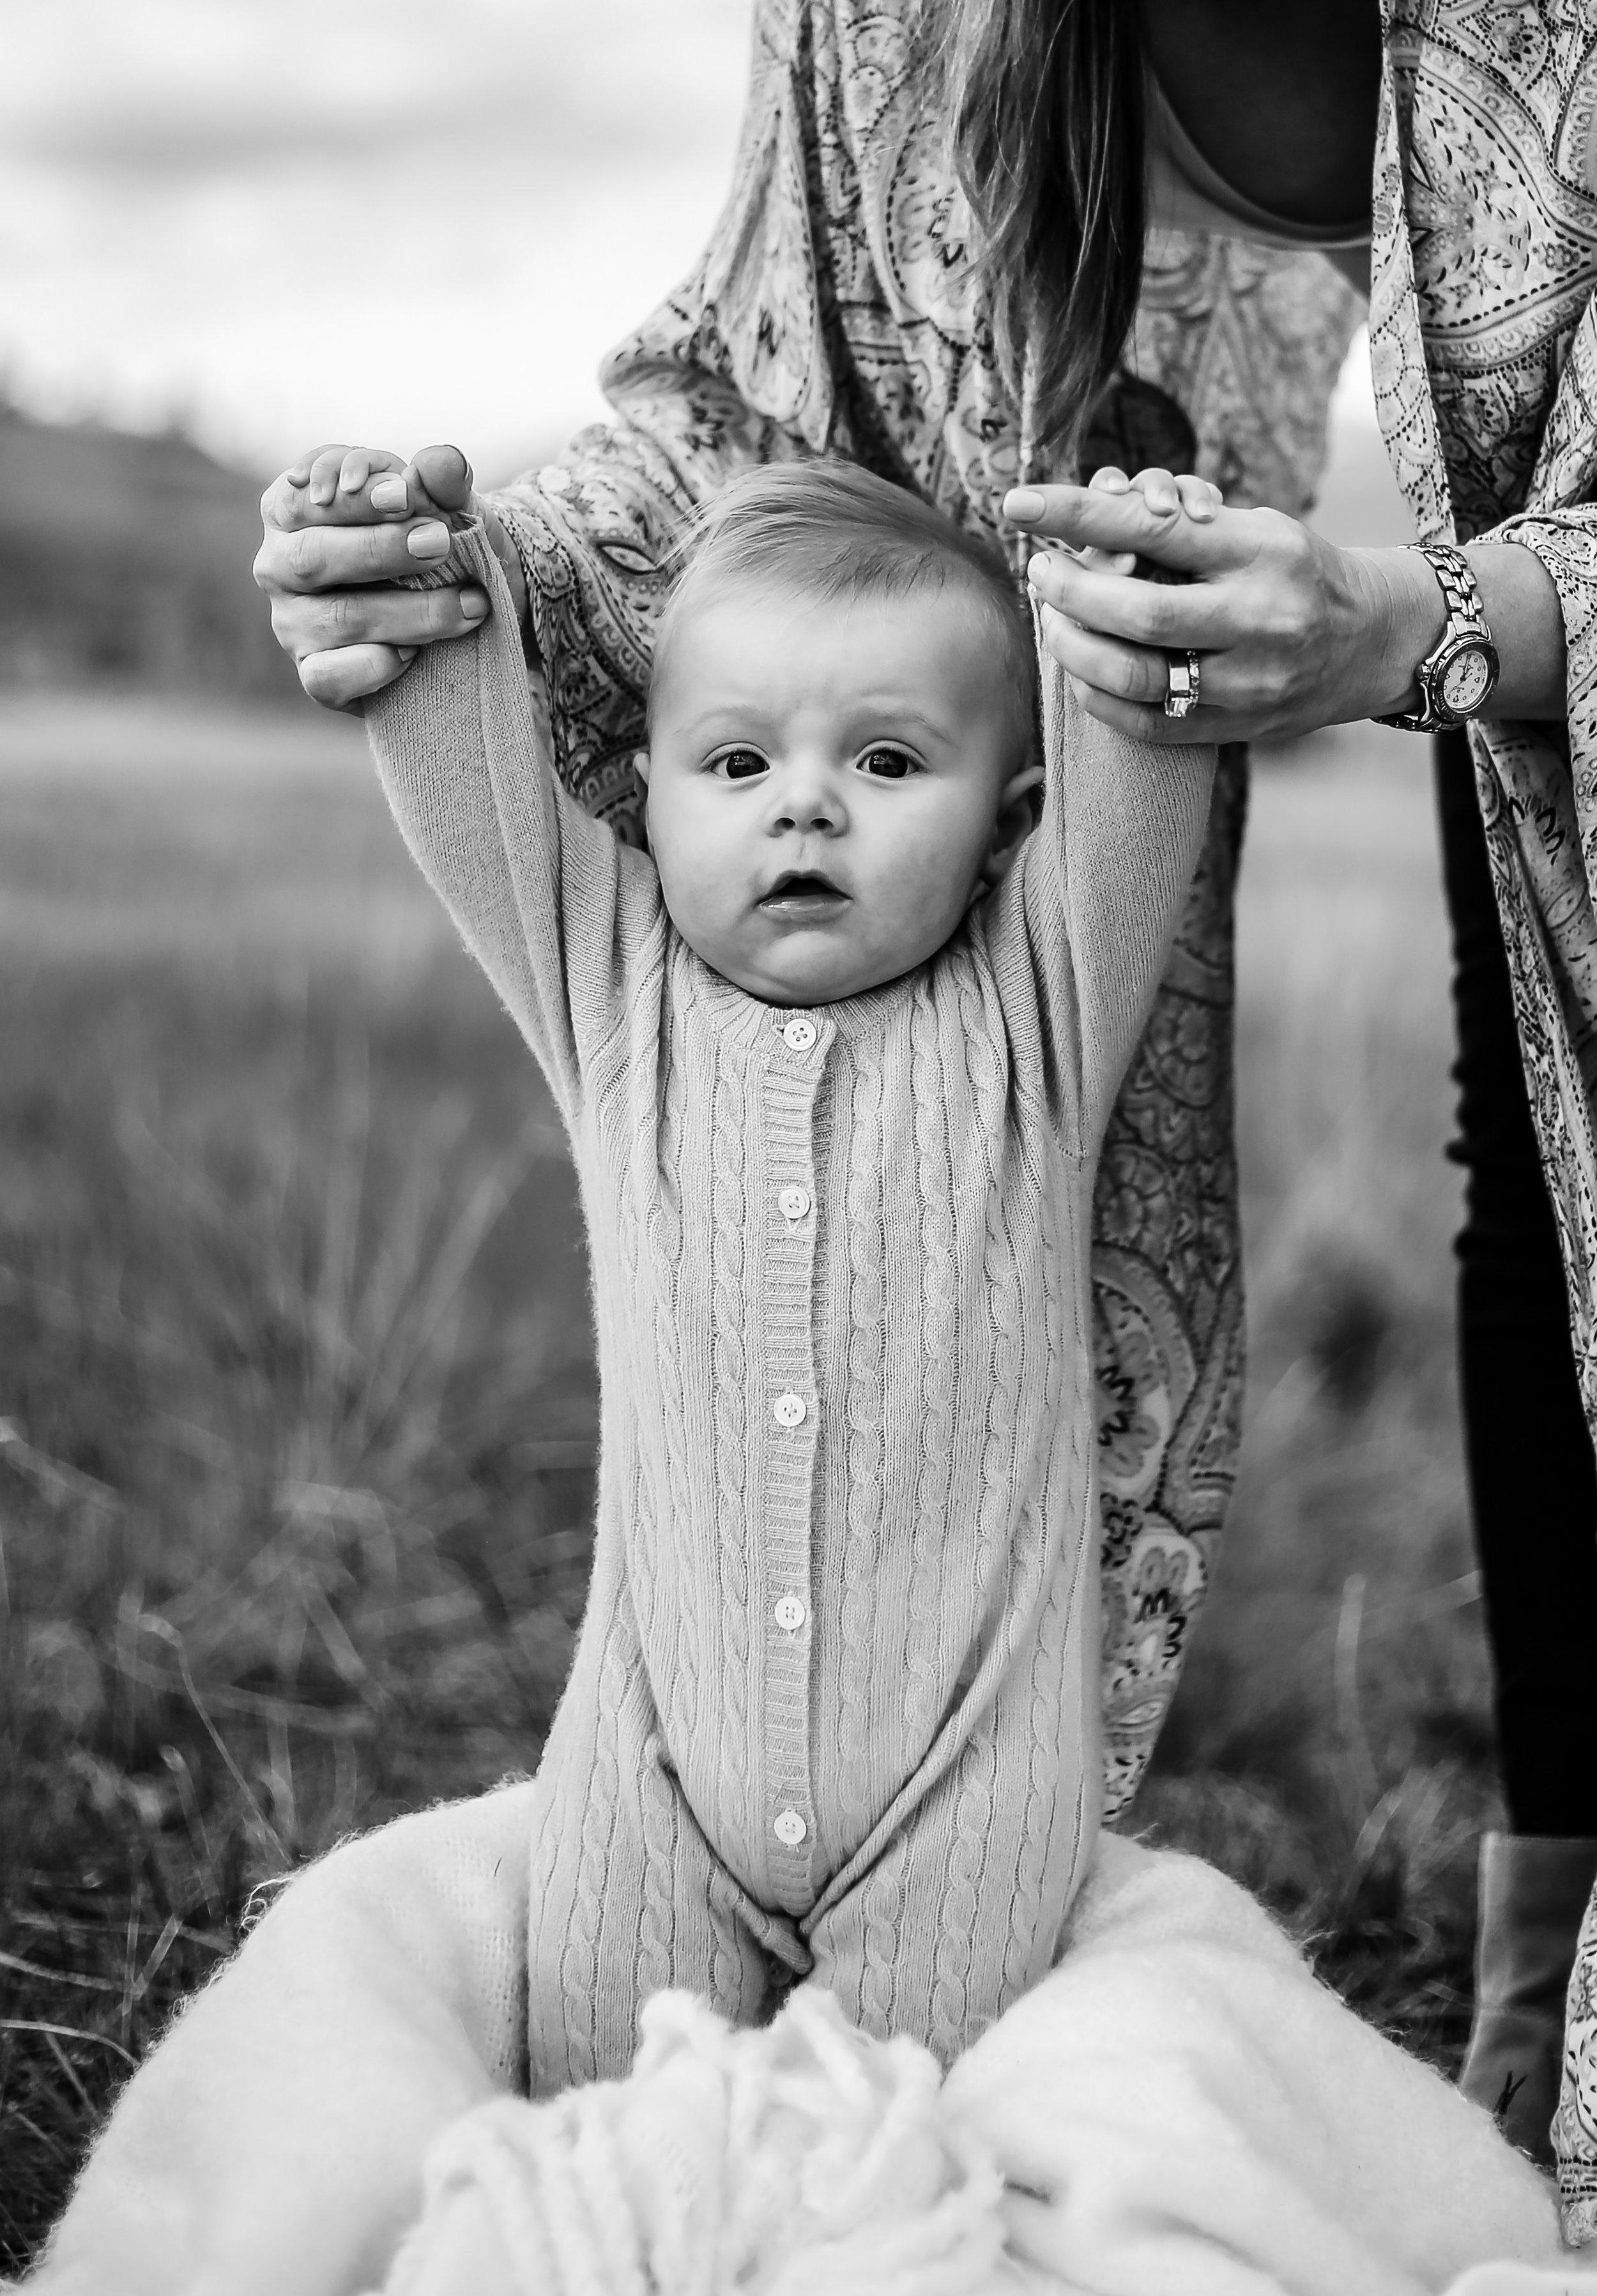 missoula-family-photographer-apaytonphoto-24.jpg